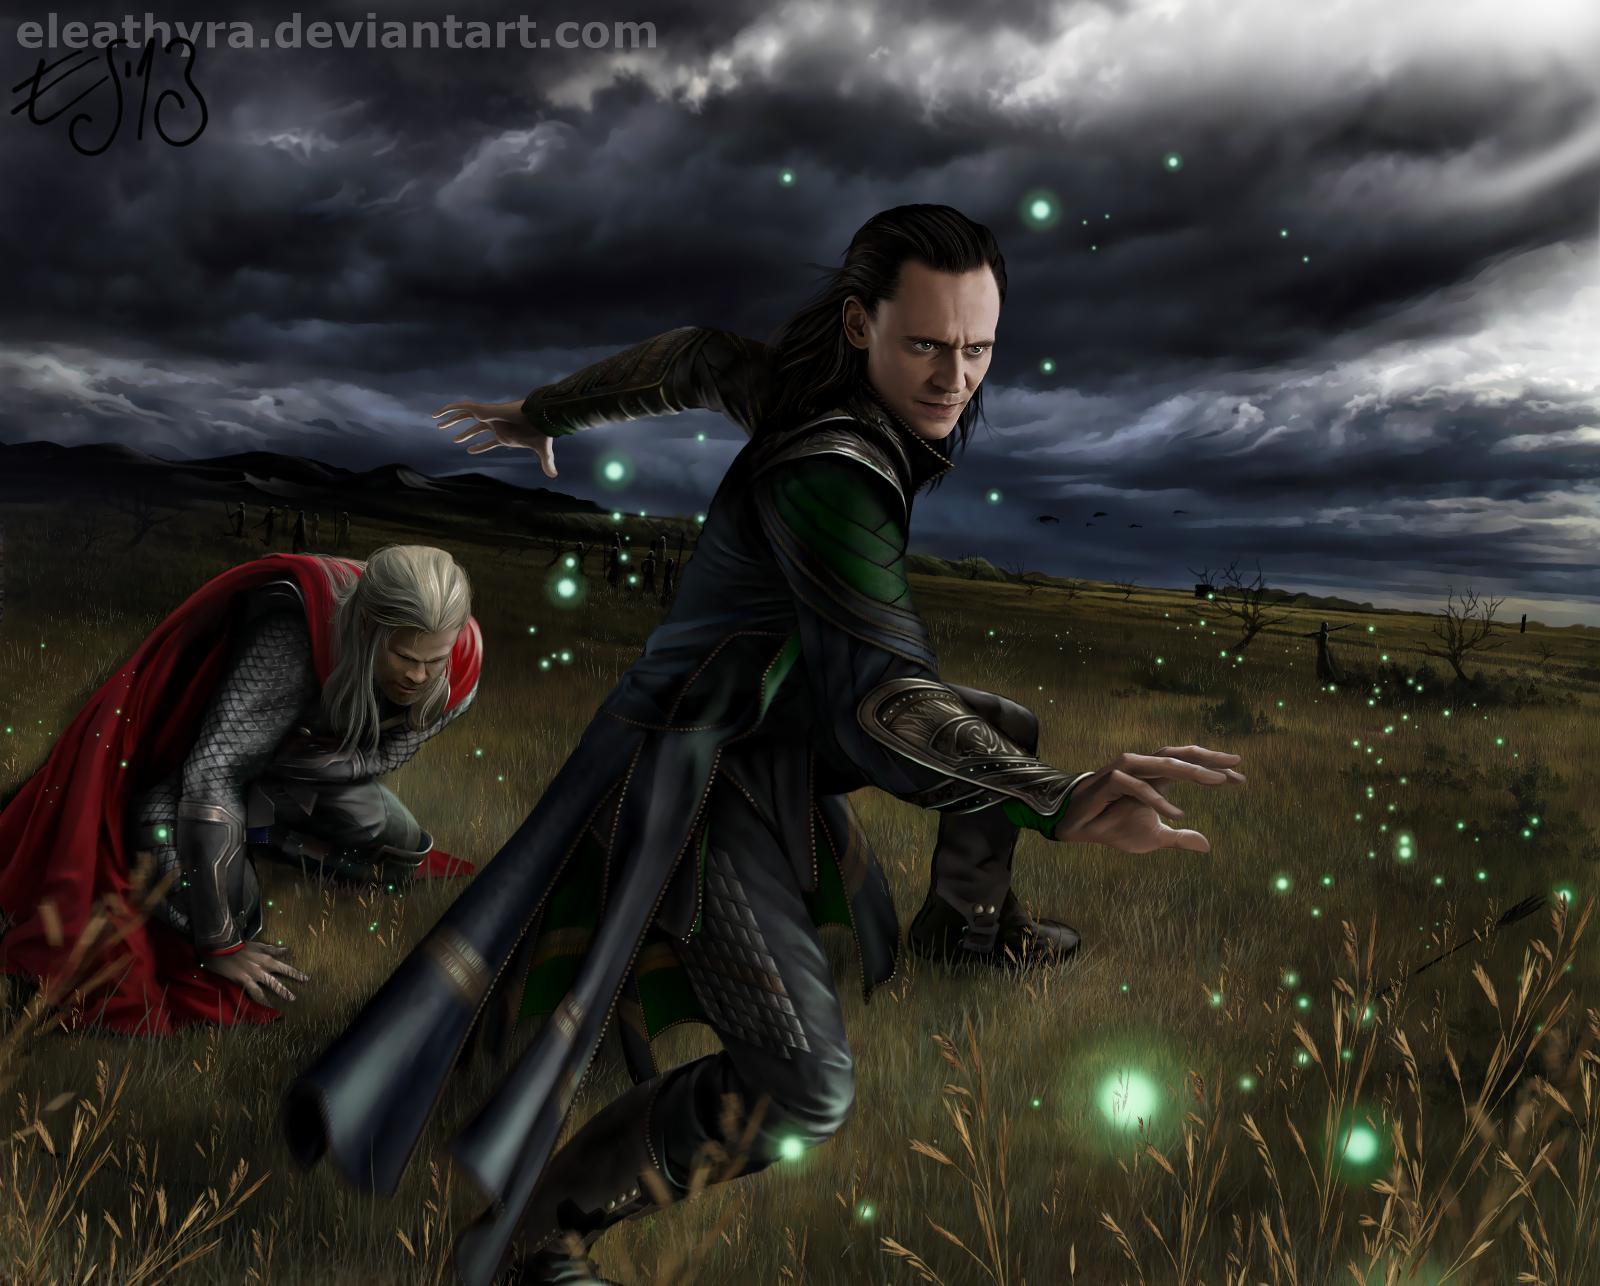 Thor and Loki by eleathyra